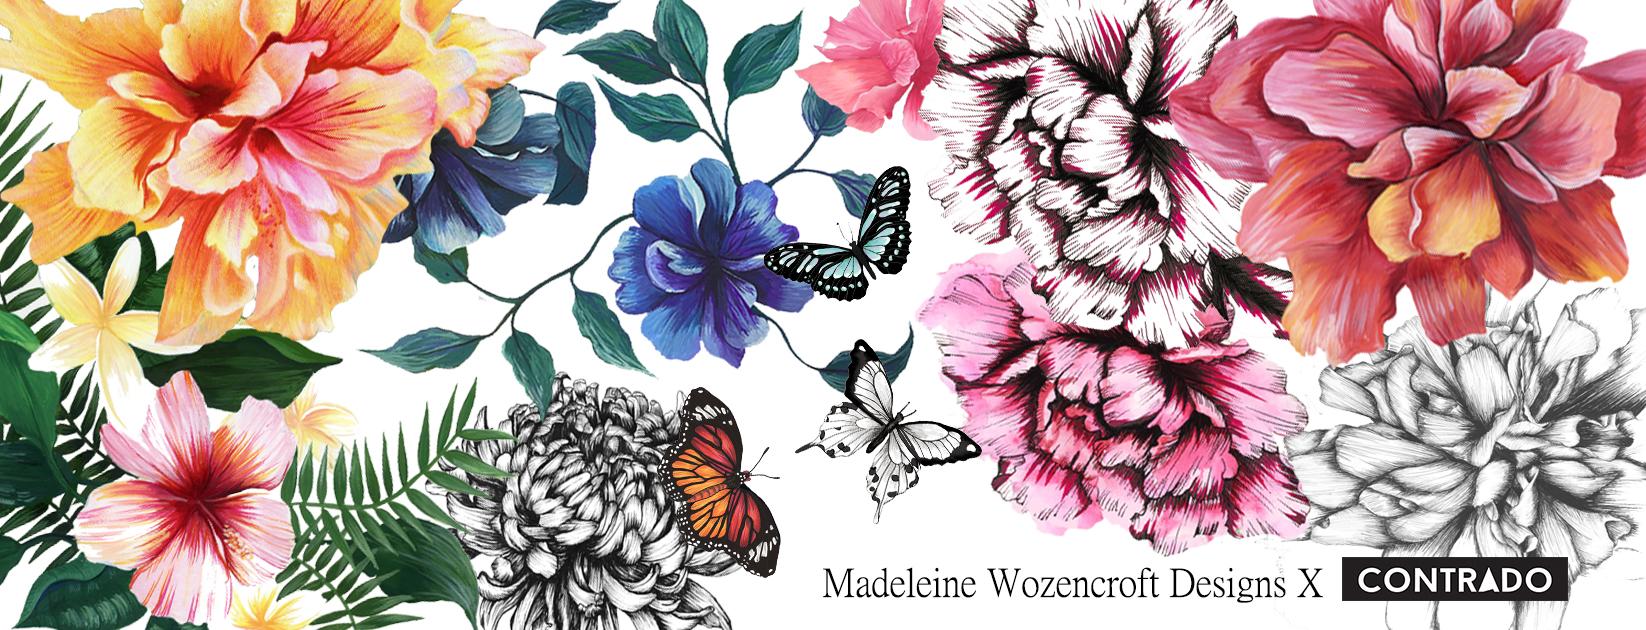 Madeleine Wozencroft